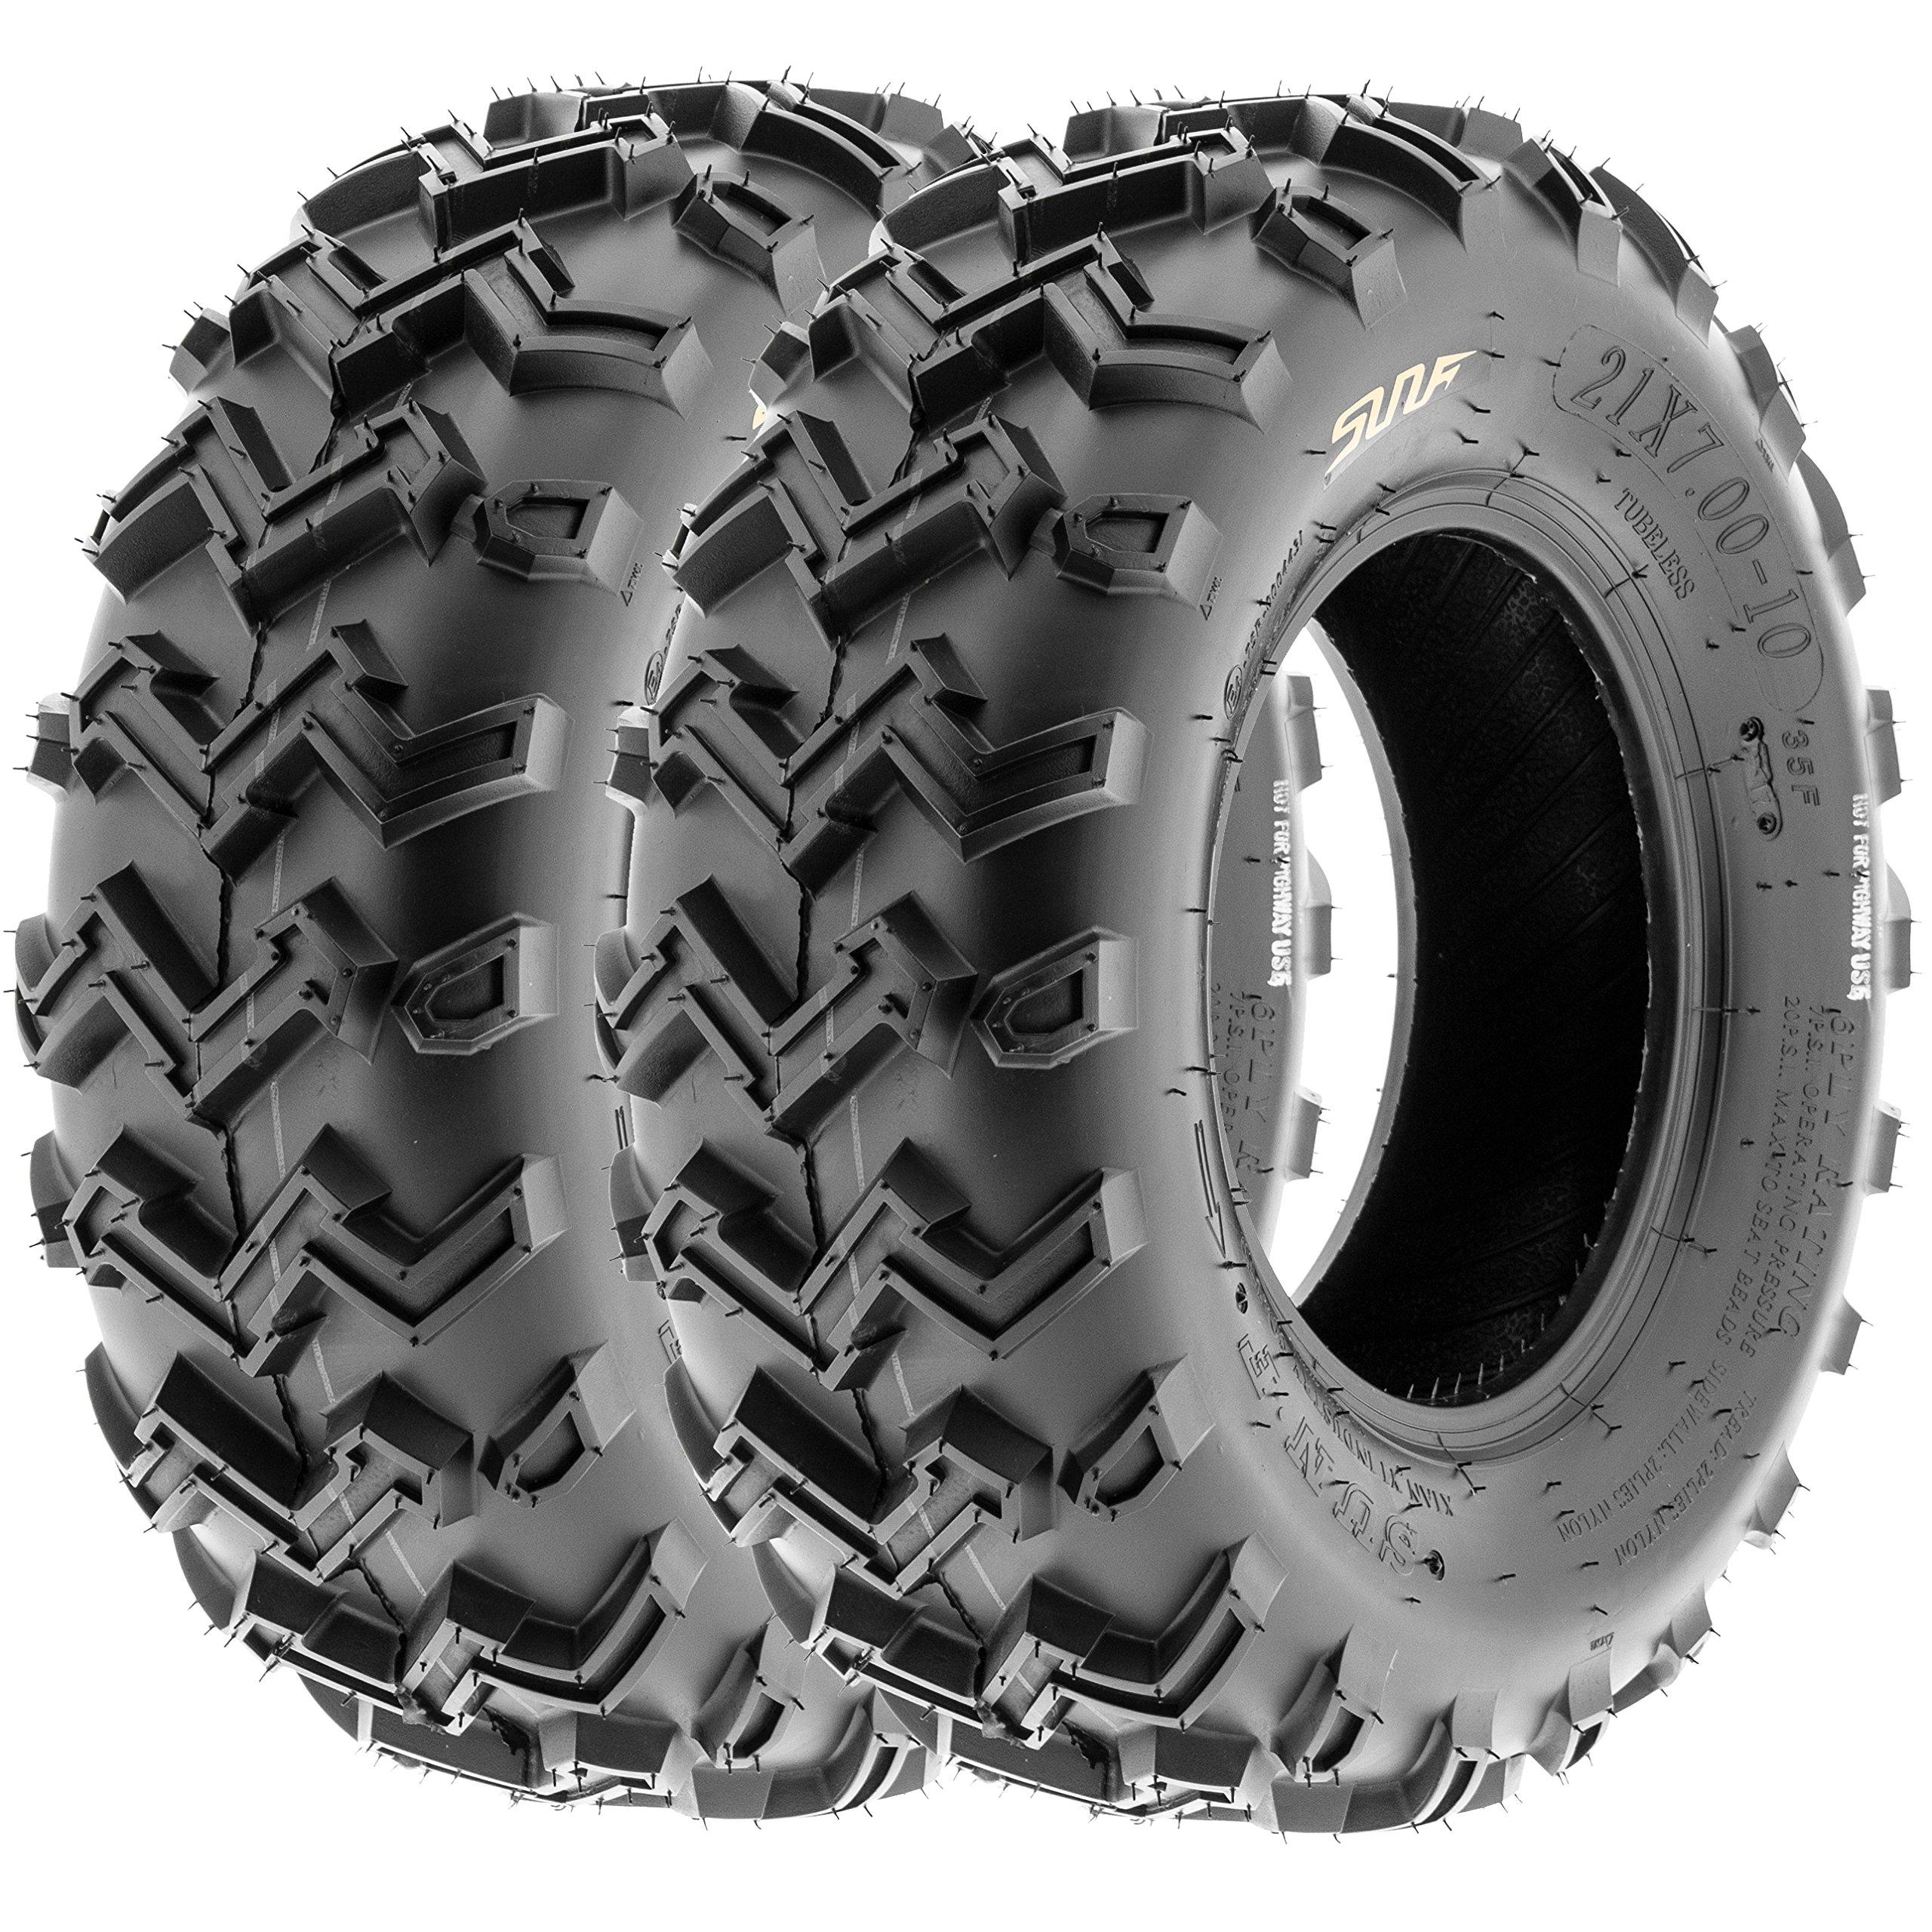 SunF ATV UTV Front Tires 24x8-12 24x8x12 4 PLY A001 (Set Pair of 2)